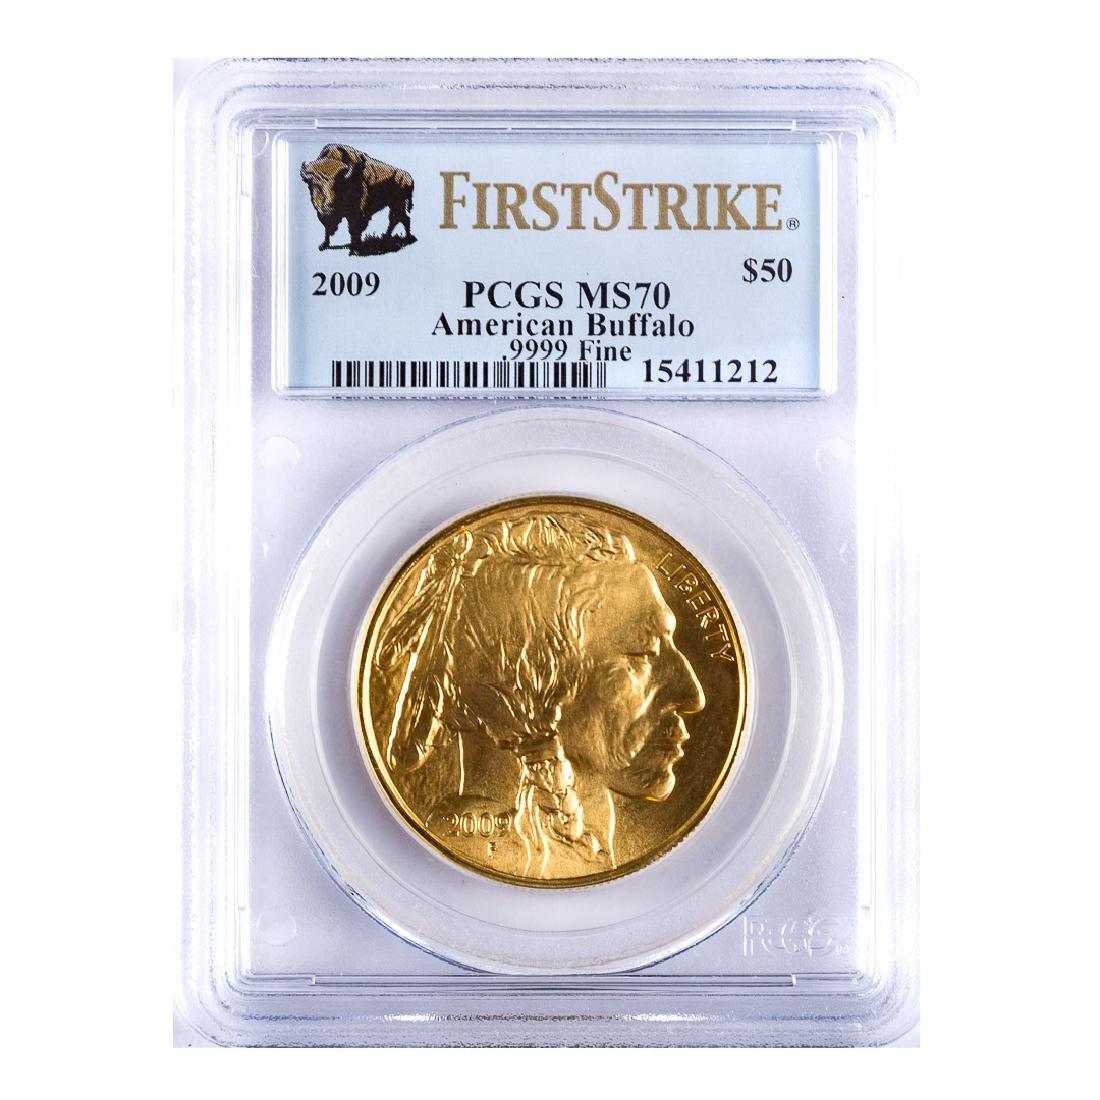 [US] 2009 Gold American Buffalo 1 Oz. PCGS MS70